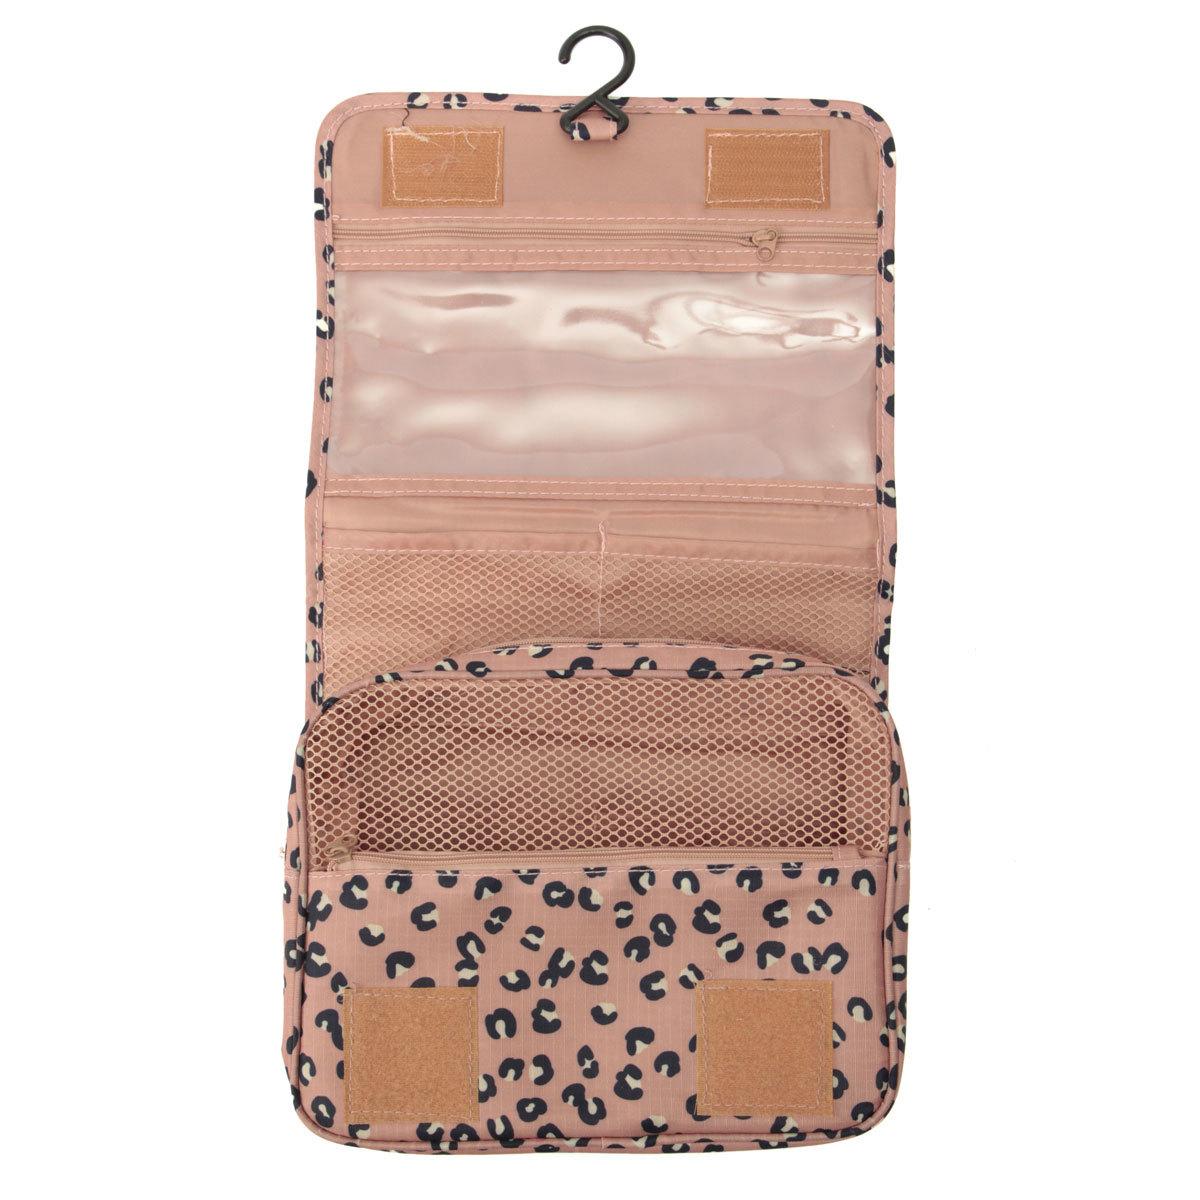 Philippines Travel Folding Wash Toiletry Bag Hanging Women Make Up Cosmetics Organizer Cosmetic Case Pink